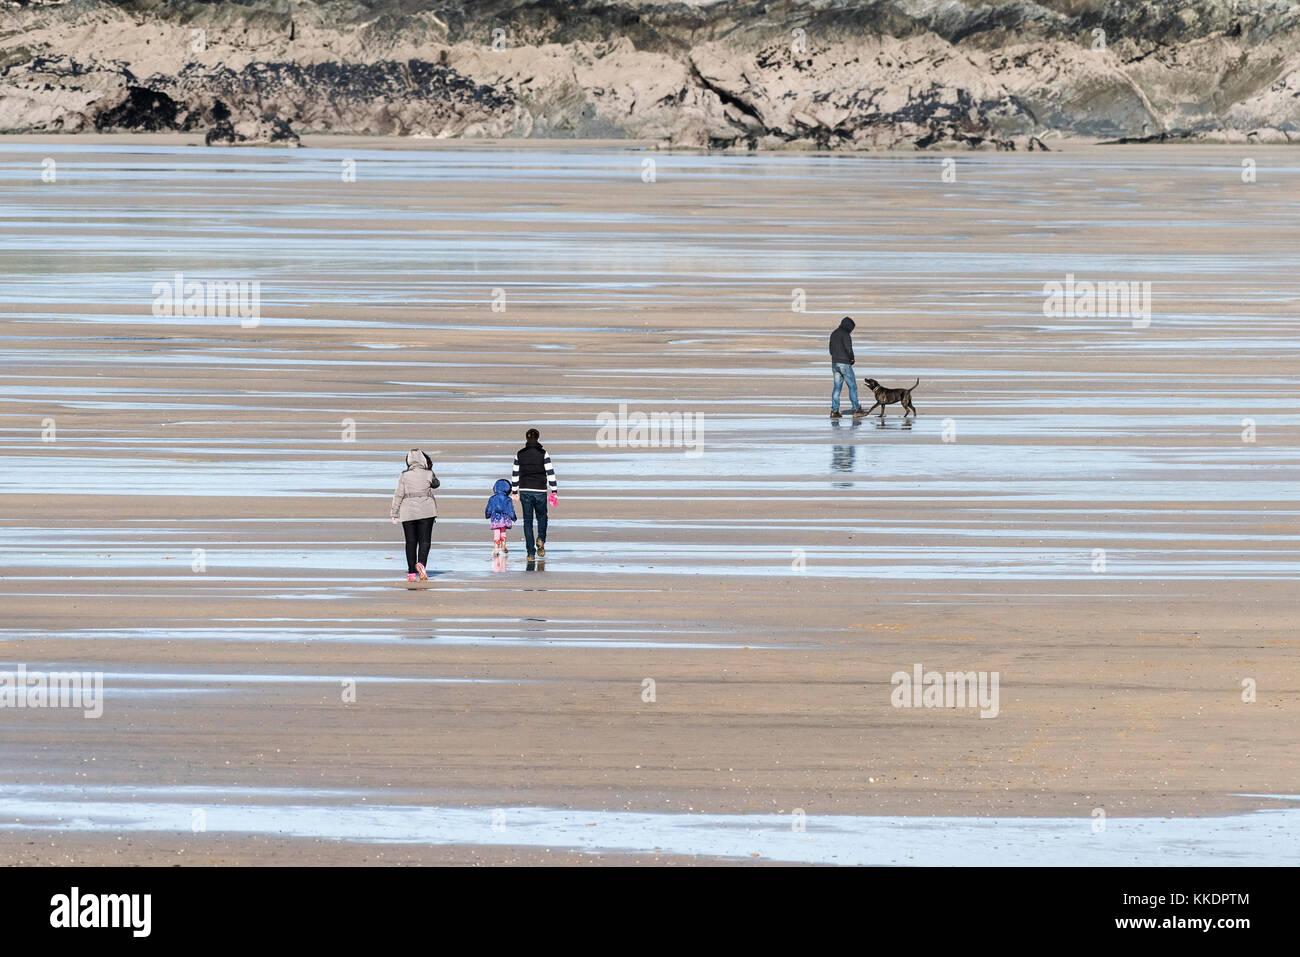 Fistral Beach newquay - Menschen zu Fuß über den Fistral Beach bei Ebbe Newquay Cornwall. Stockbild